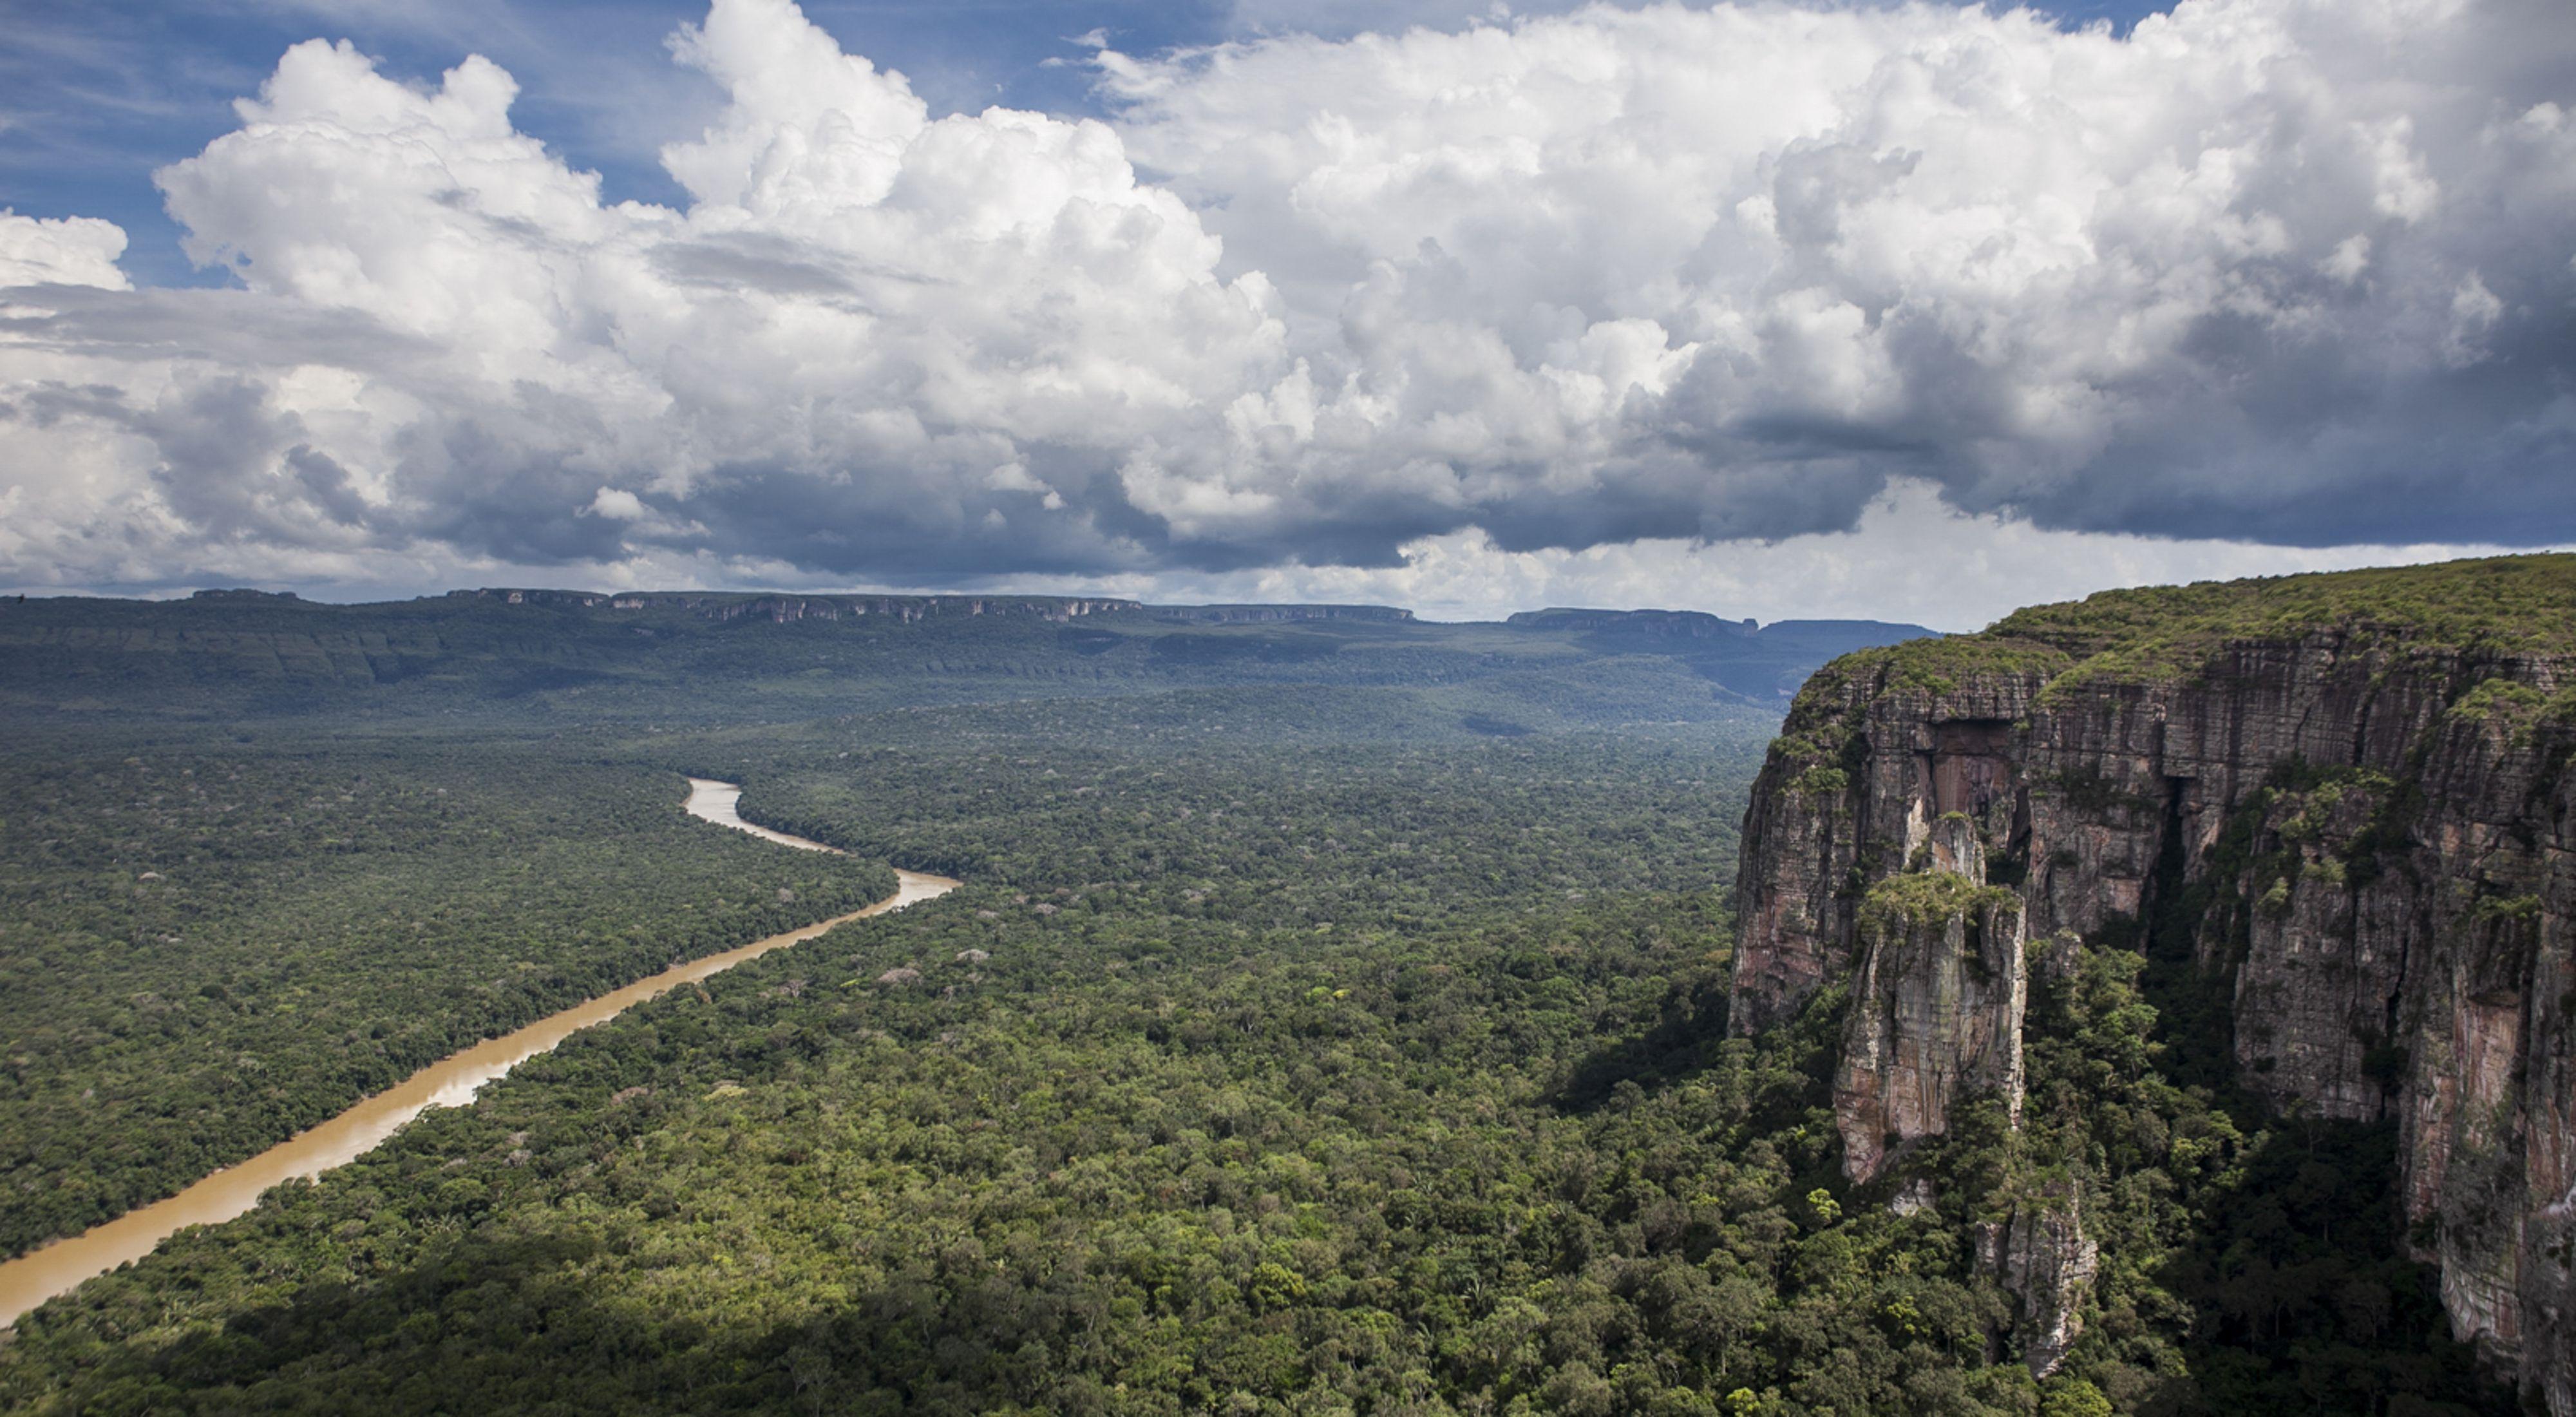 Parque Nacional Natural Sierra de Chiribiquete in Colombia